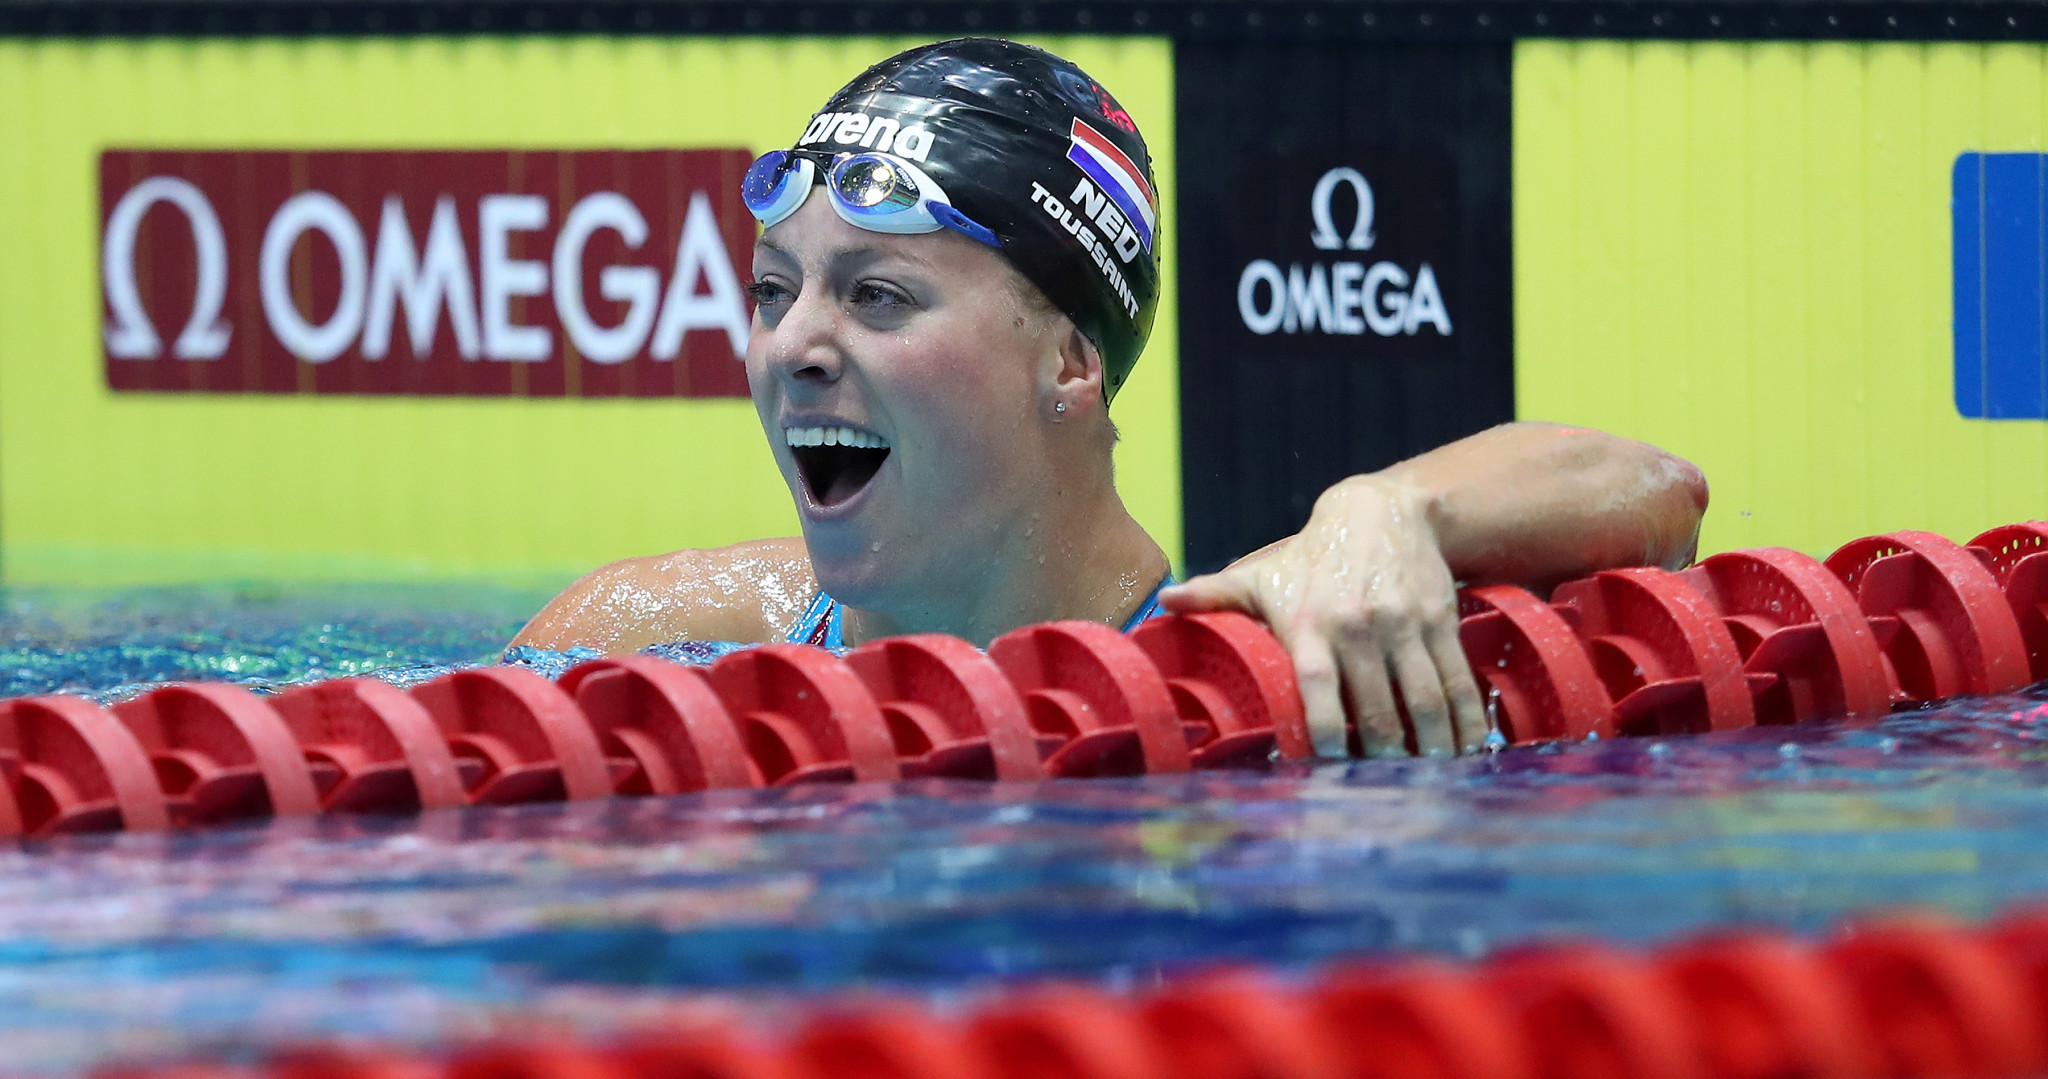 Dutch swimmer Kira Toussaint won the women's 100m backstroke to deny Katinka Hosszú ©Getty Images